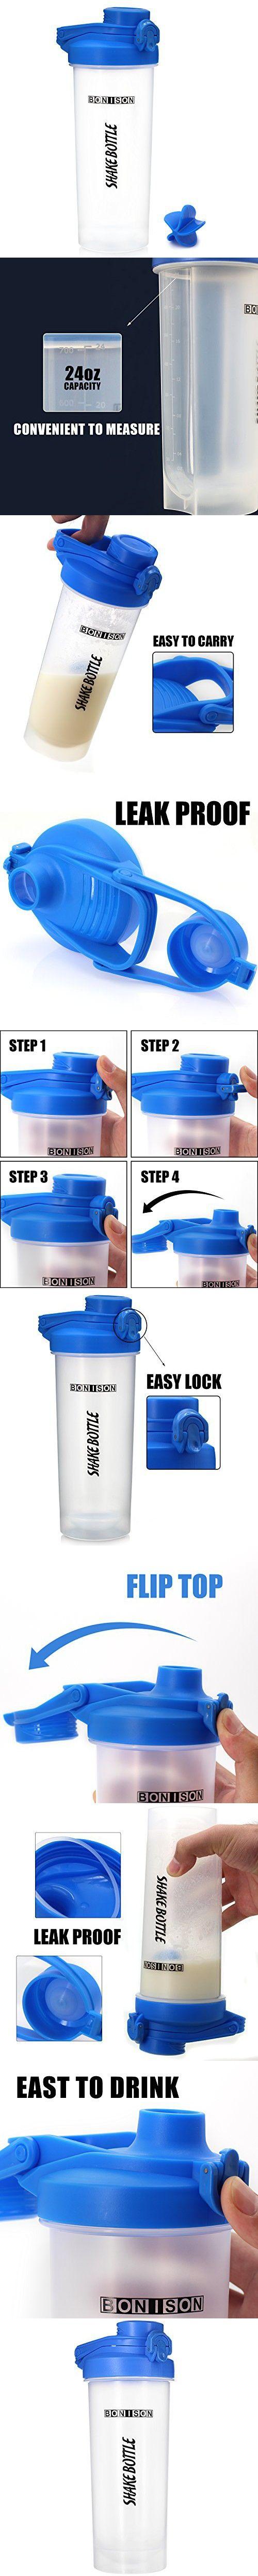 Newest 24 OZ Twist Cap Shake Bottle BPA and Phthalate-Free Plastic Mixer Protein Smoothies Shakes Mix Powders Shaker Bottle -Blue